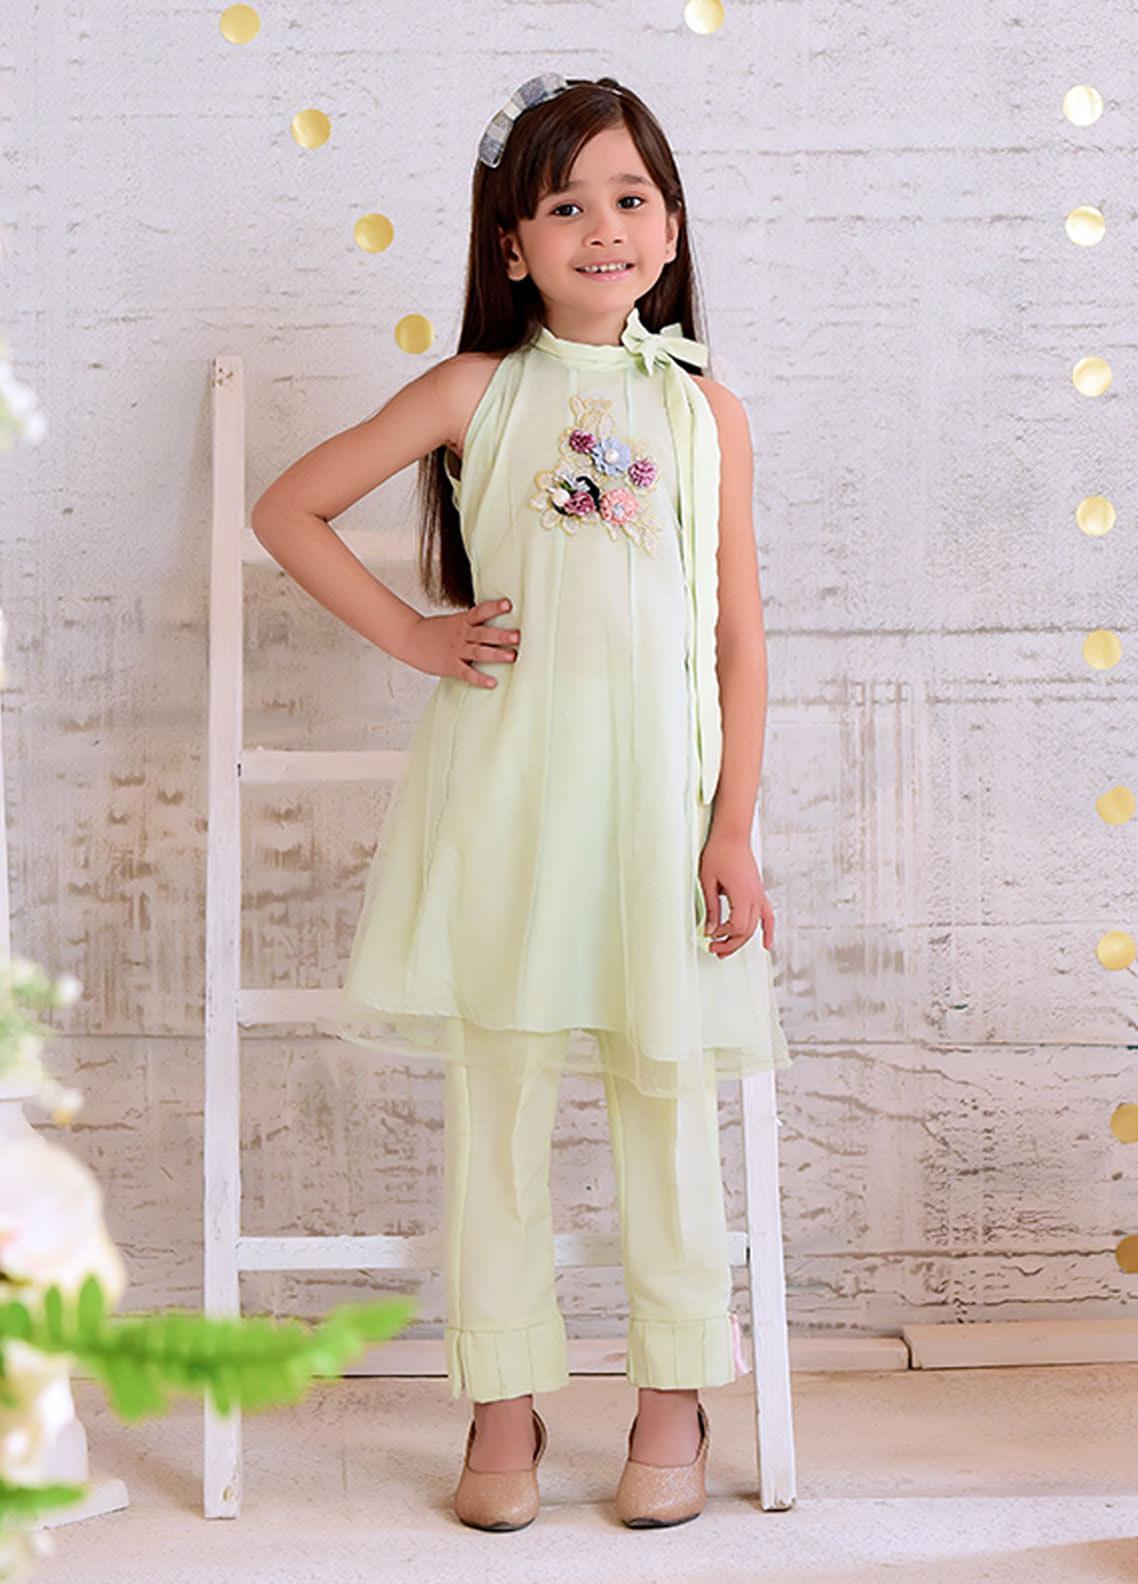 Ochre Chiffon Formal 2 Piece Suit for Girls -  OFW 253 Mint Green